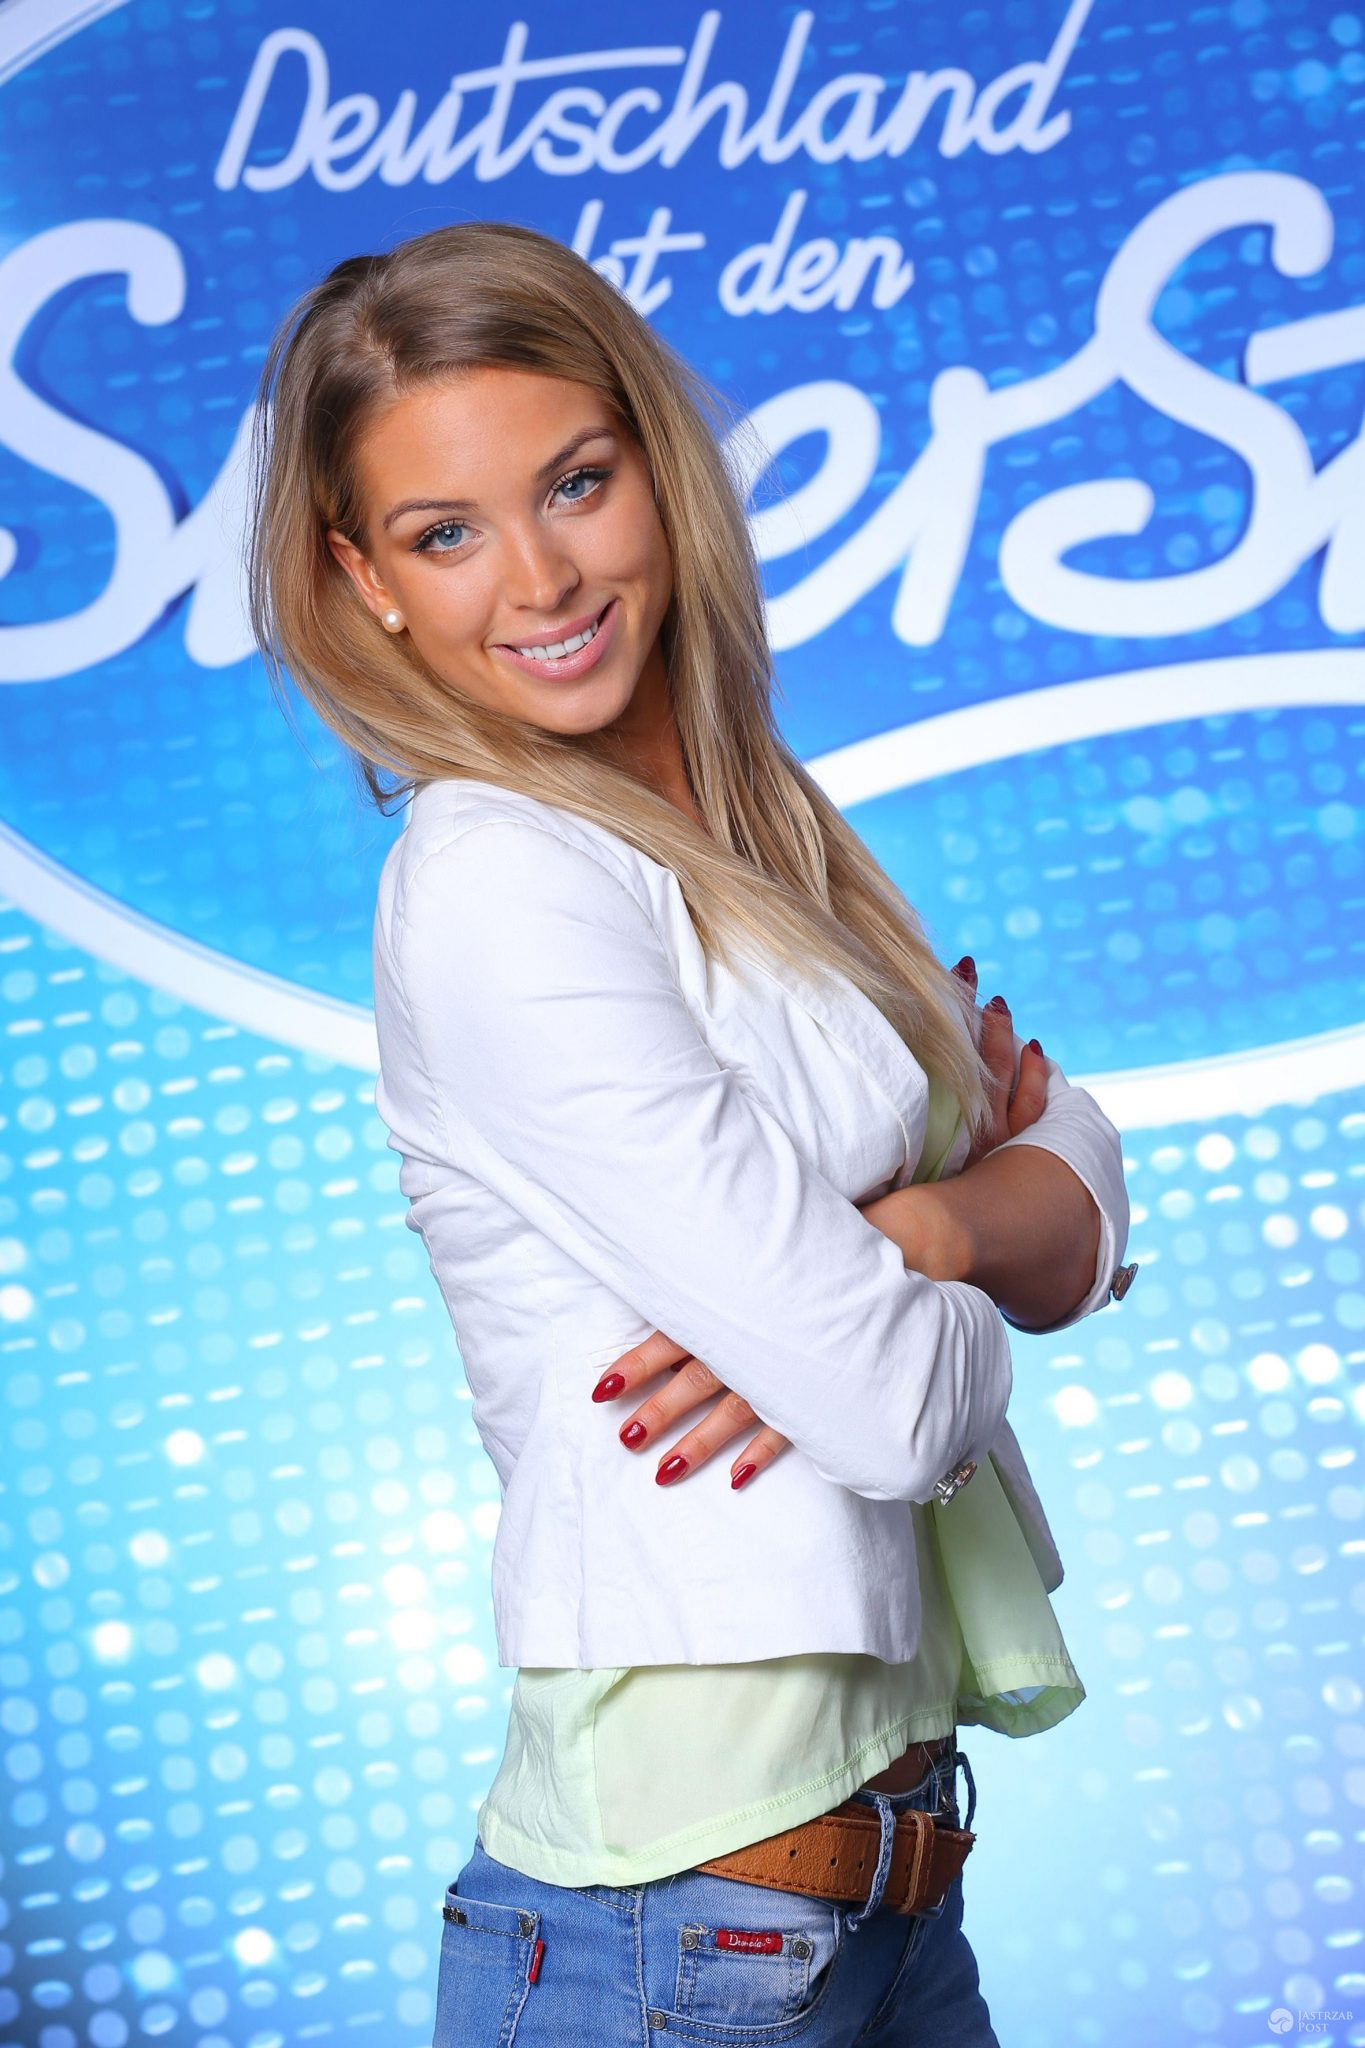 Kandydaci na Eurowizję 2017 z Polski: Aneta Sablik - Ulalala